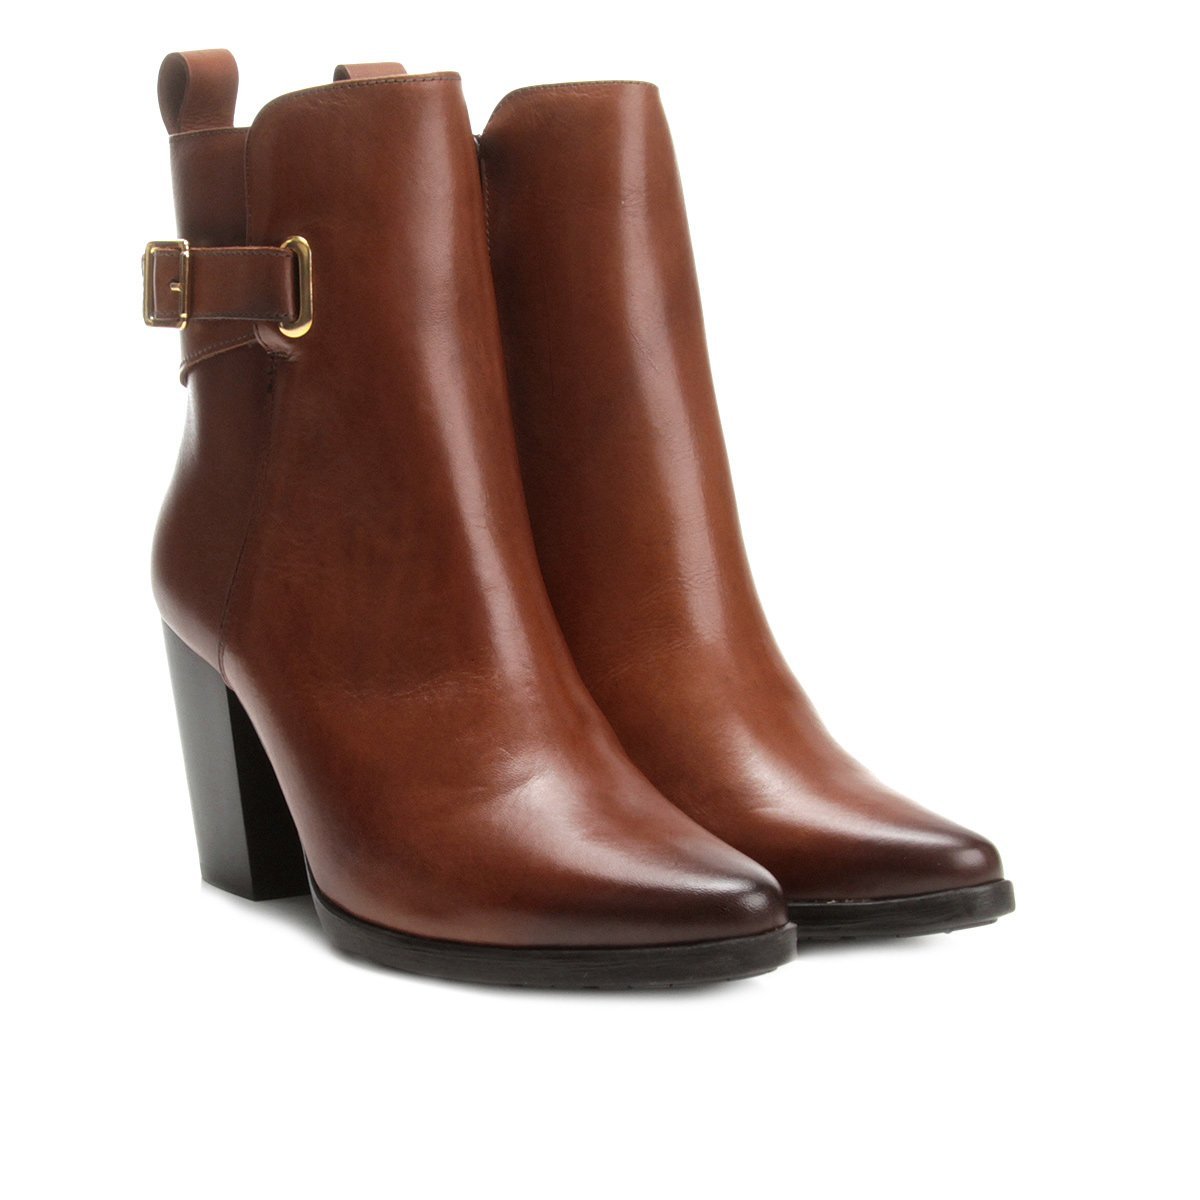 9811668837 Bota Couro Cano Curto Shoestock Salto Alto Feminina - Marrom - Compre Agora